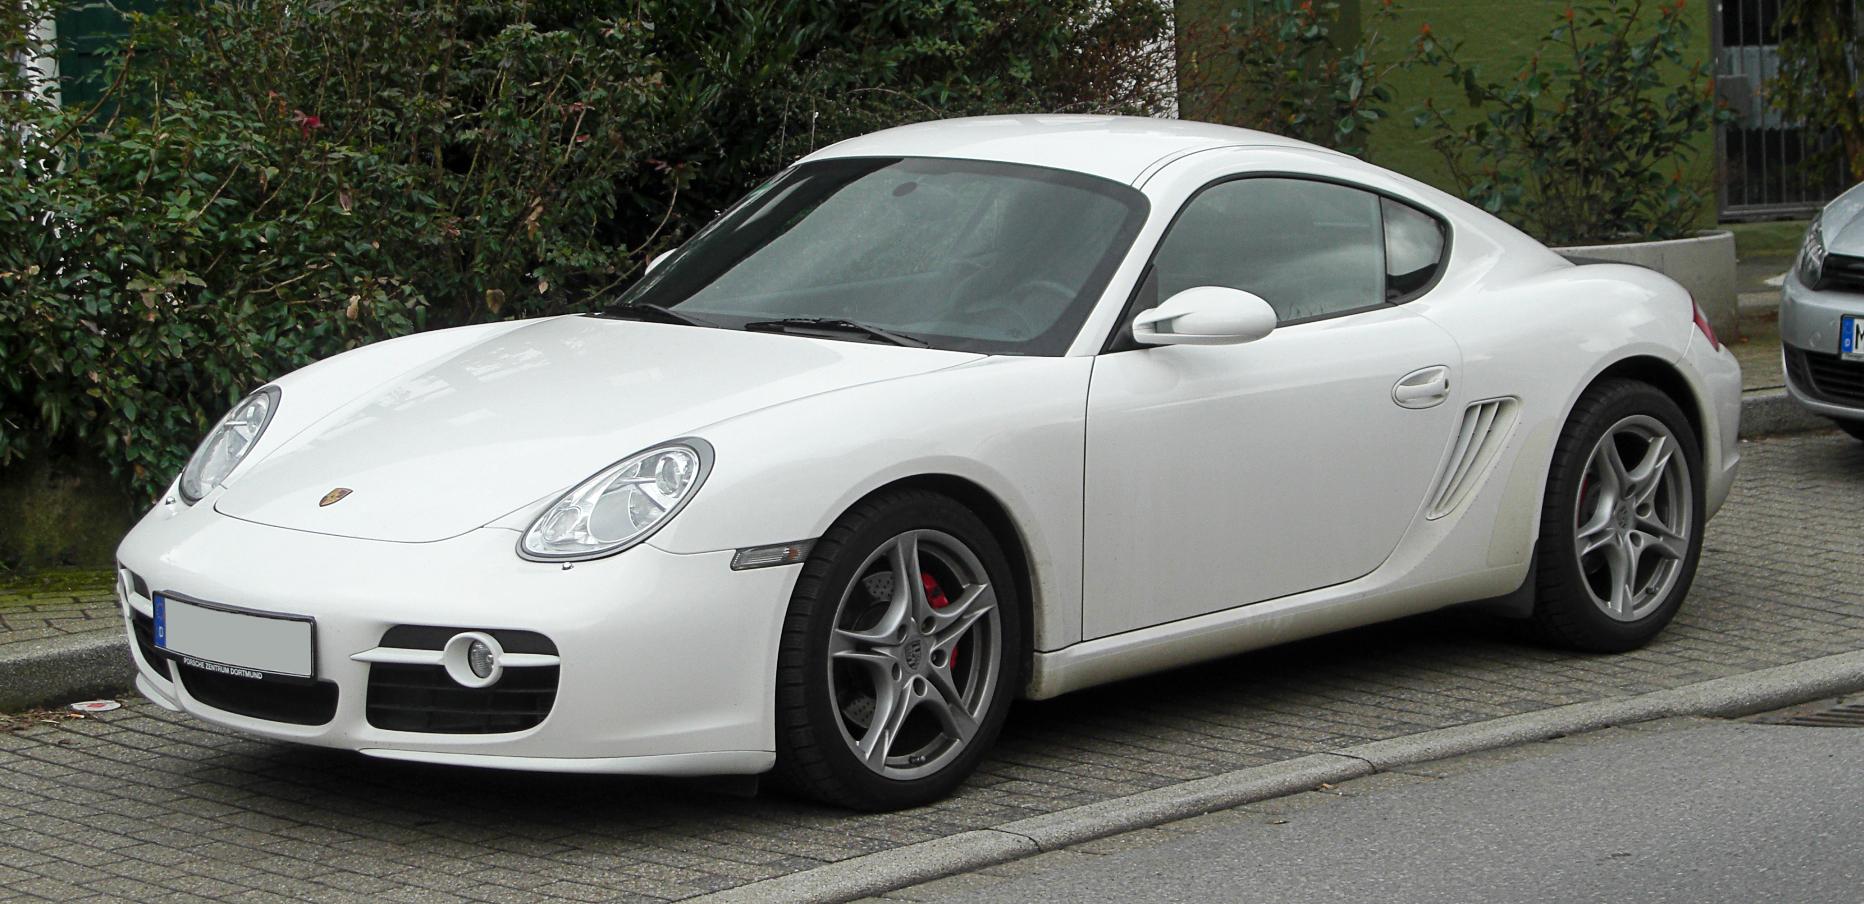 Porsche Cayman S Track Car For Sale